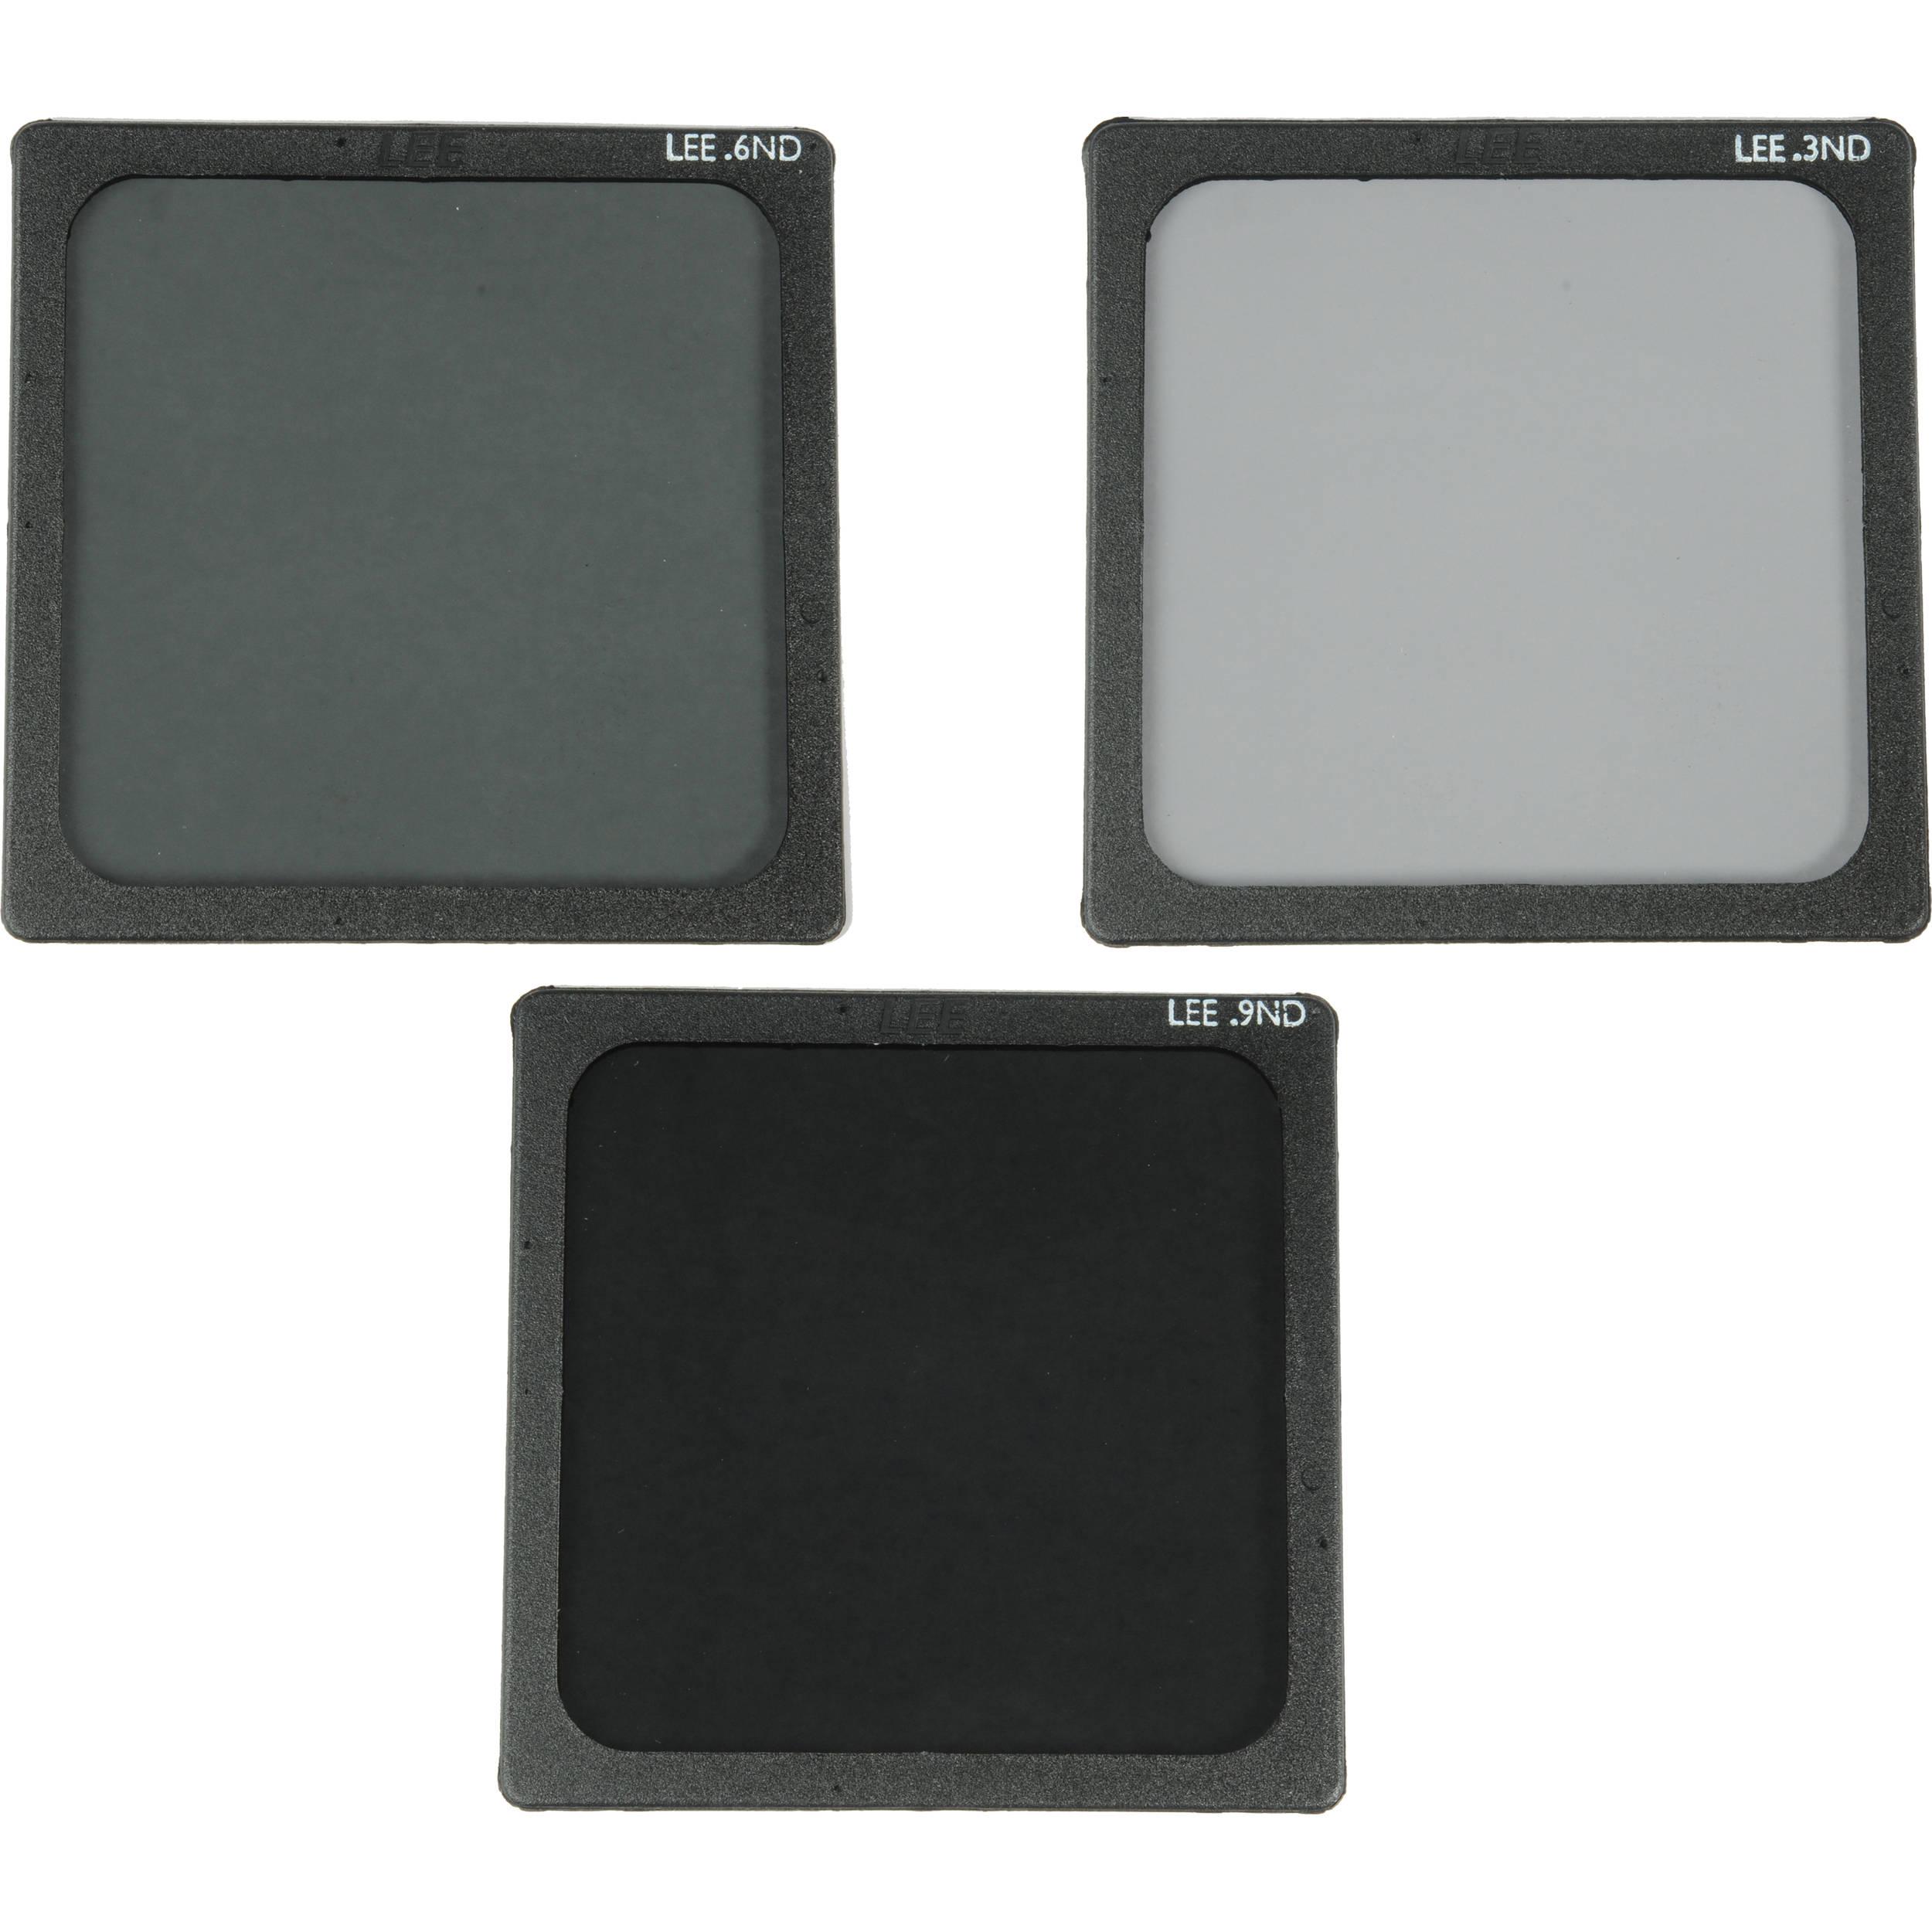 "LEE Filters 4x4"" Neutral Density Polyester Filter Set (0.3, 0.6, ..."